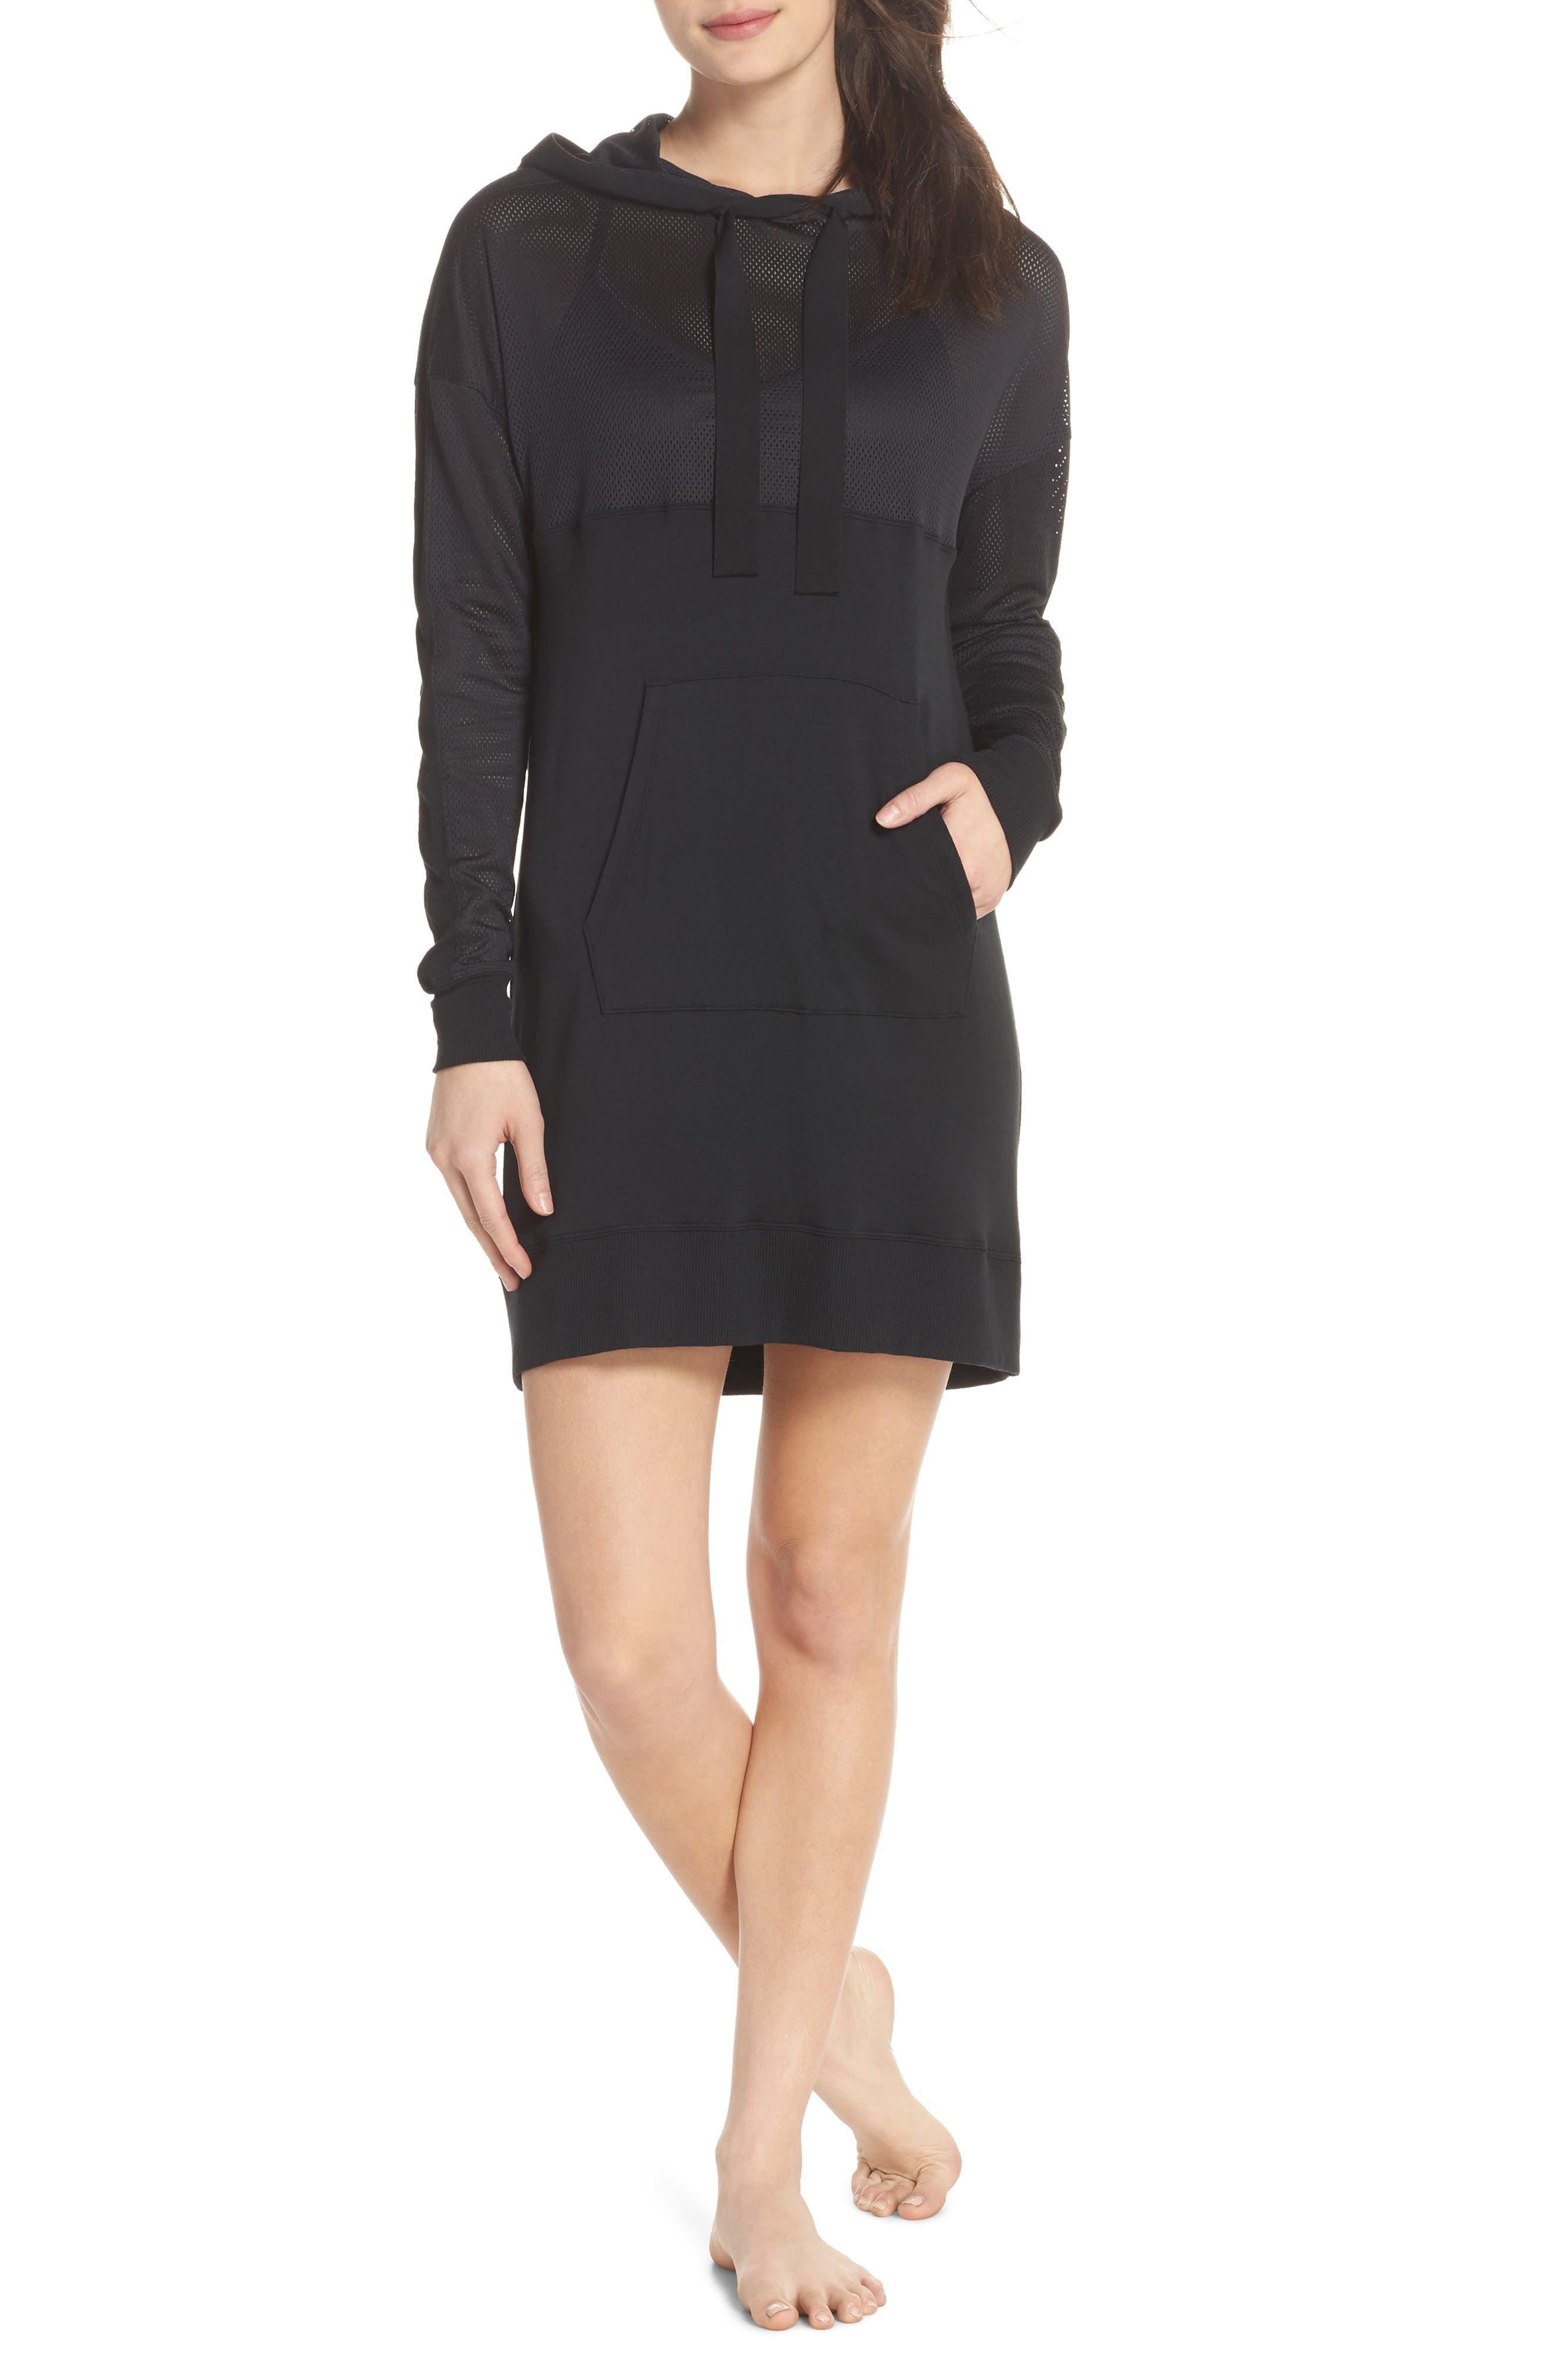 Range Dress,                         Main,                         color, Black